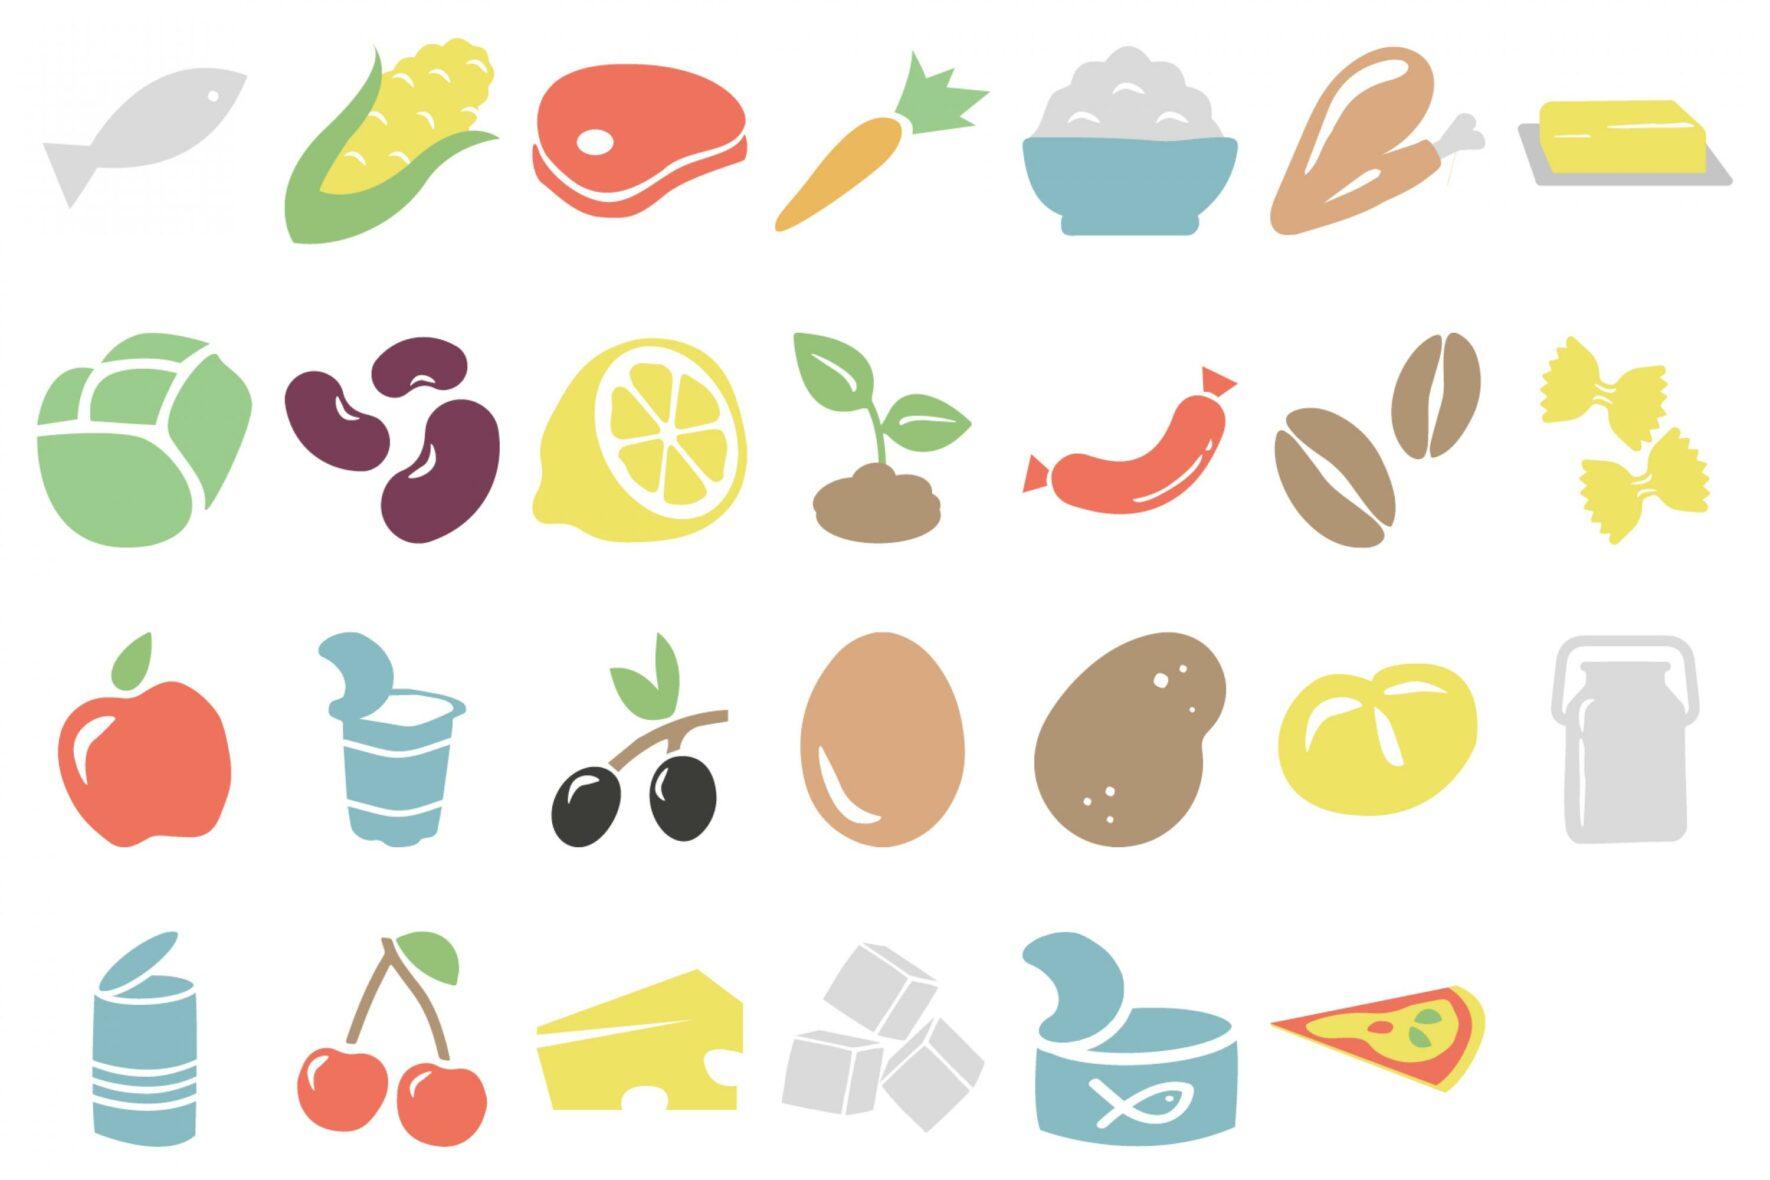 Klimarechner-Icons-FoodLabHome-Food-waste-tracker-FORMLOS-Berlin-Icons-Gestaltung